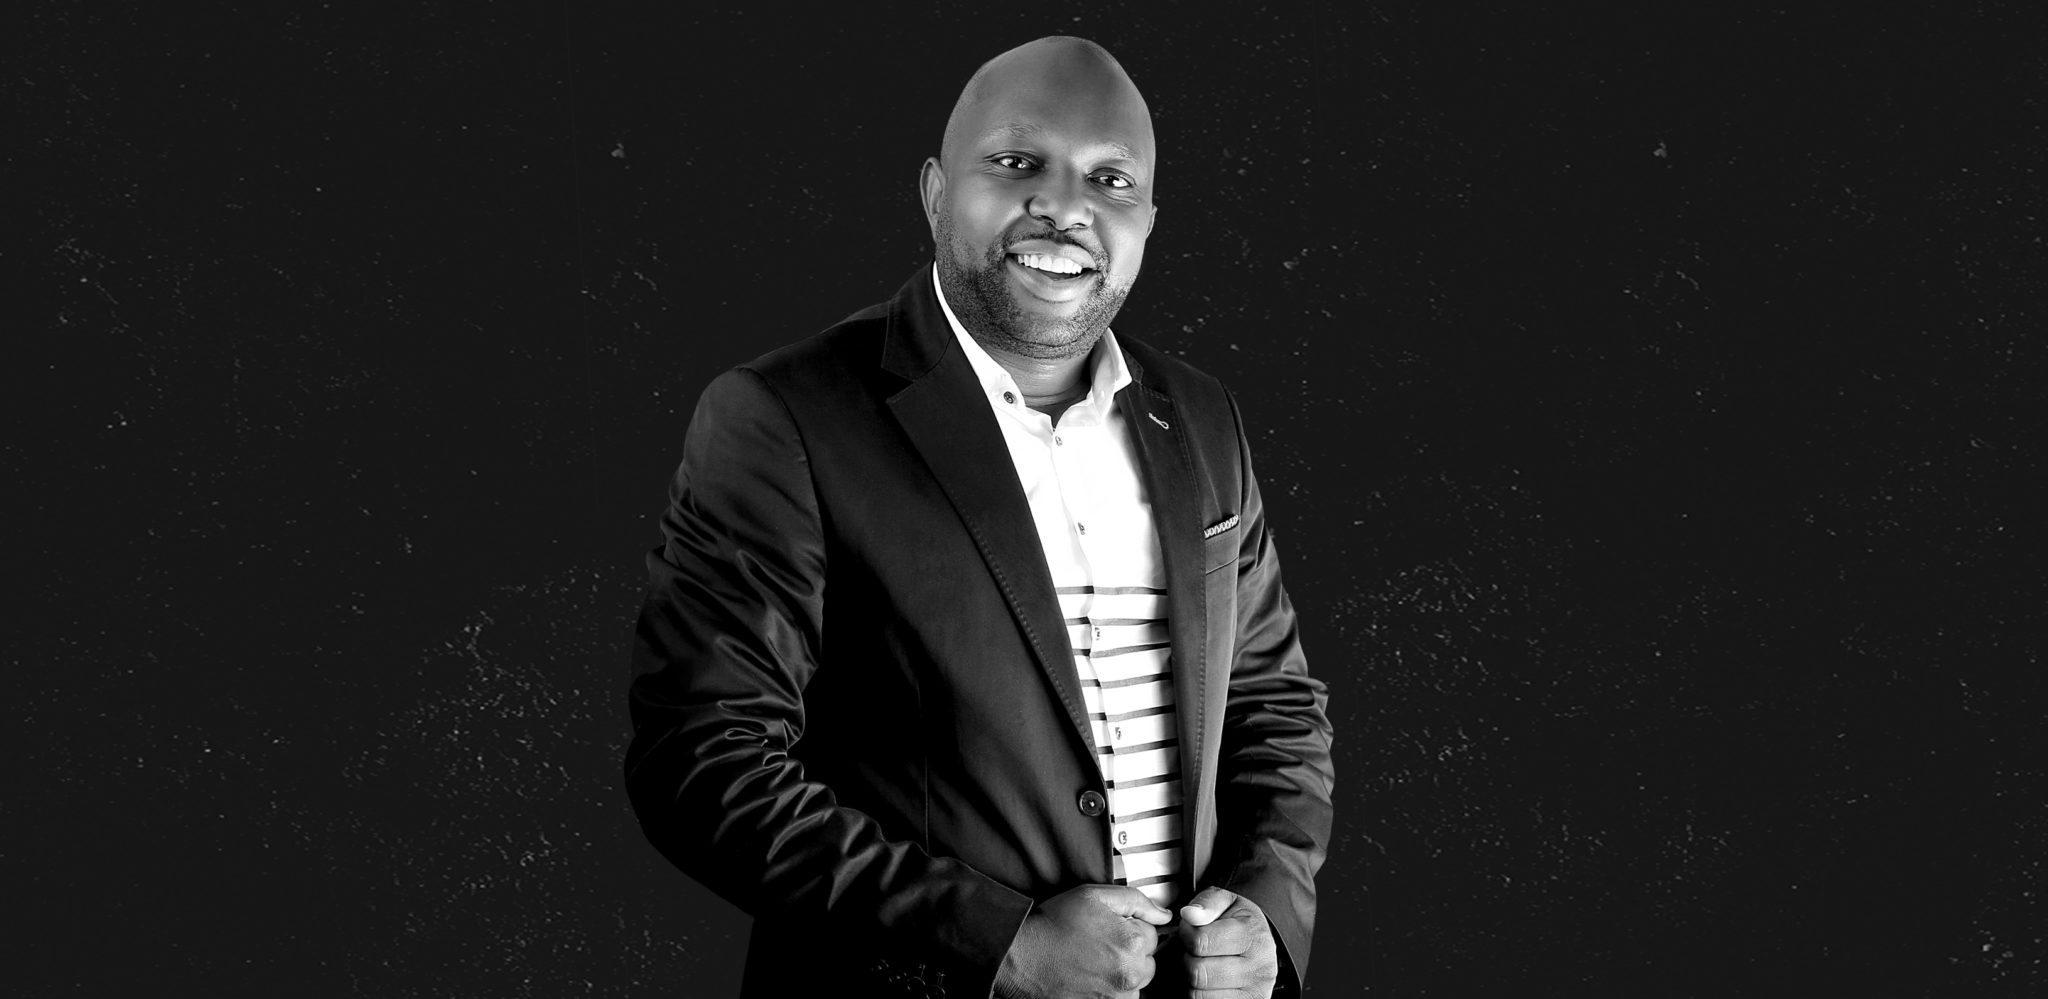 METROFM SABC on Twitter: Vusi Nova shuts it down #